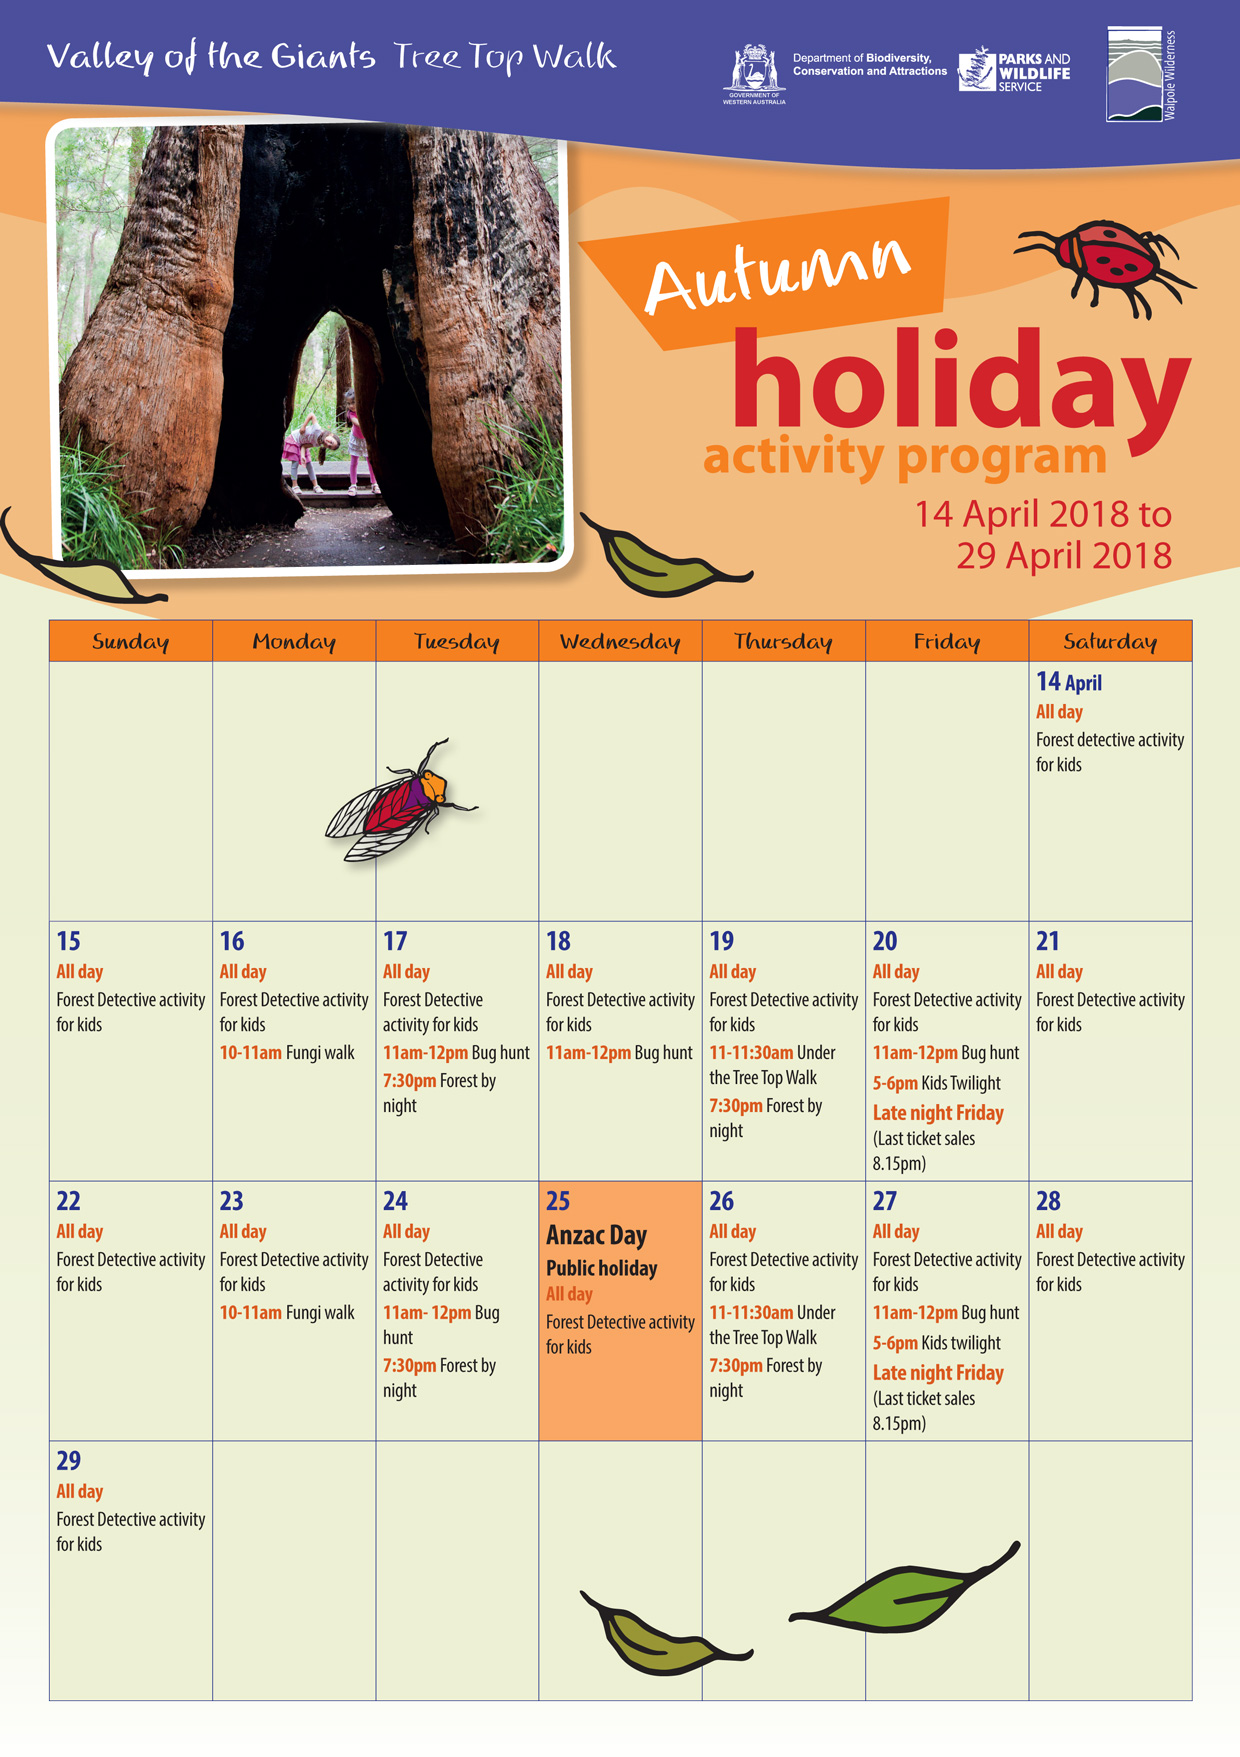 Autumn holiday activity program 2018